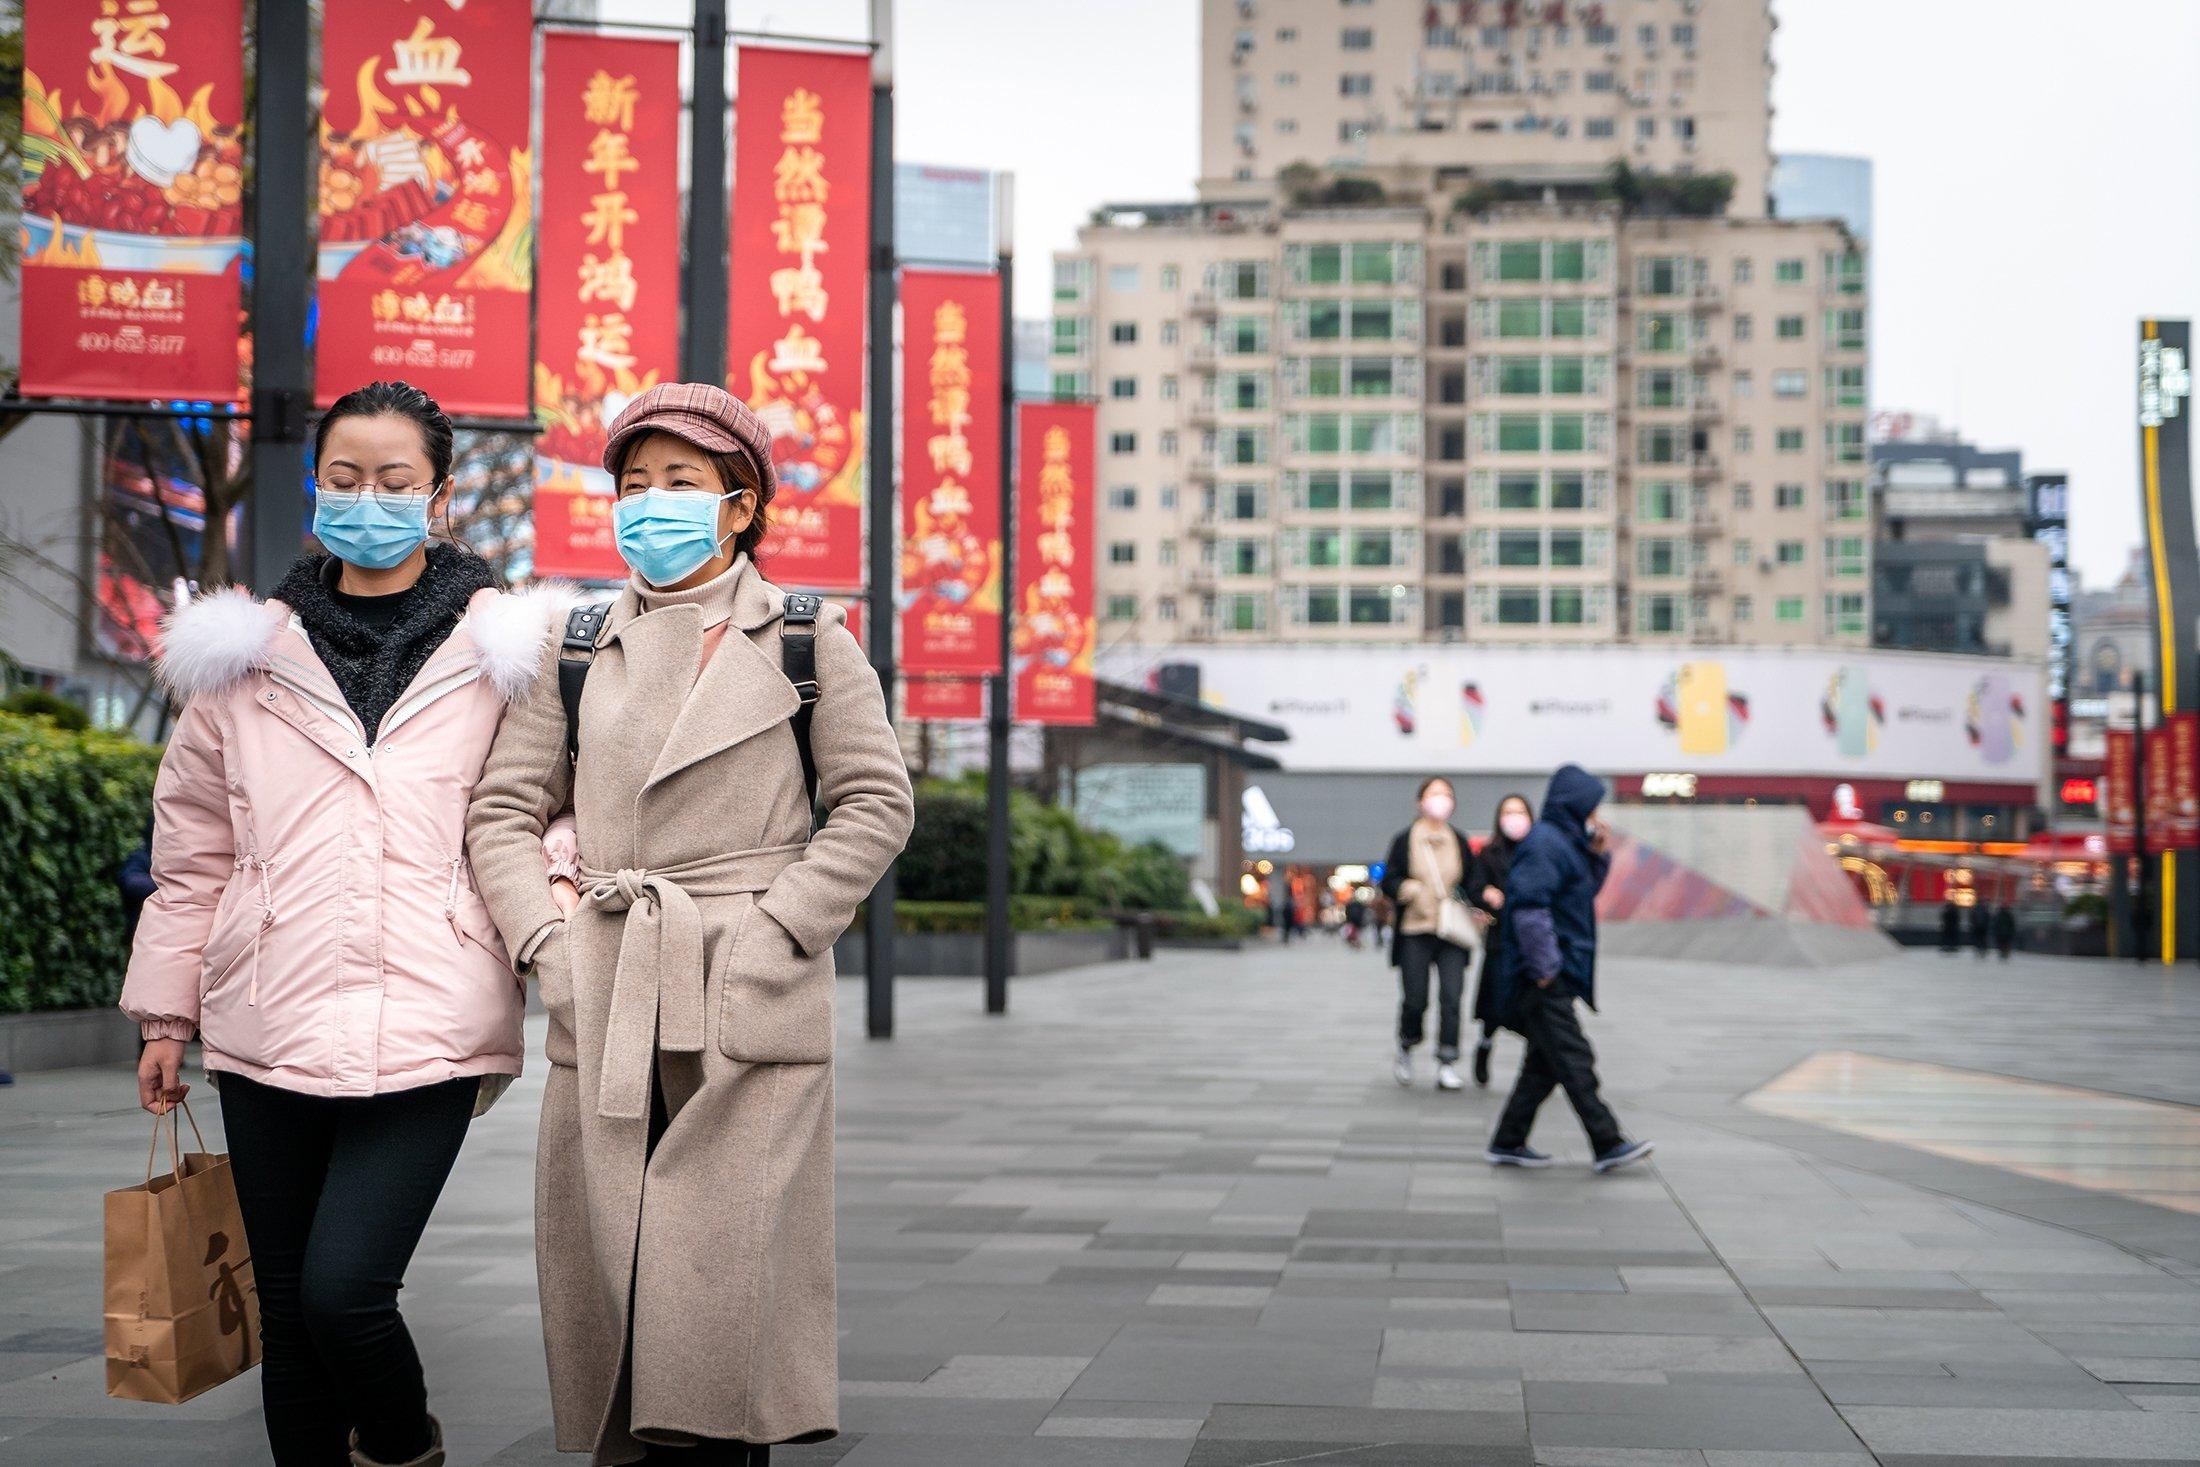 People wearing masks walking in Chengdu, China, Jan. 23, 2020. (Shutterstock Photo)